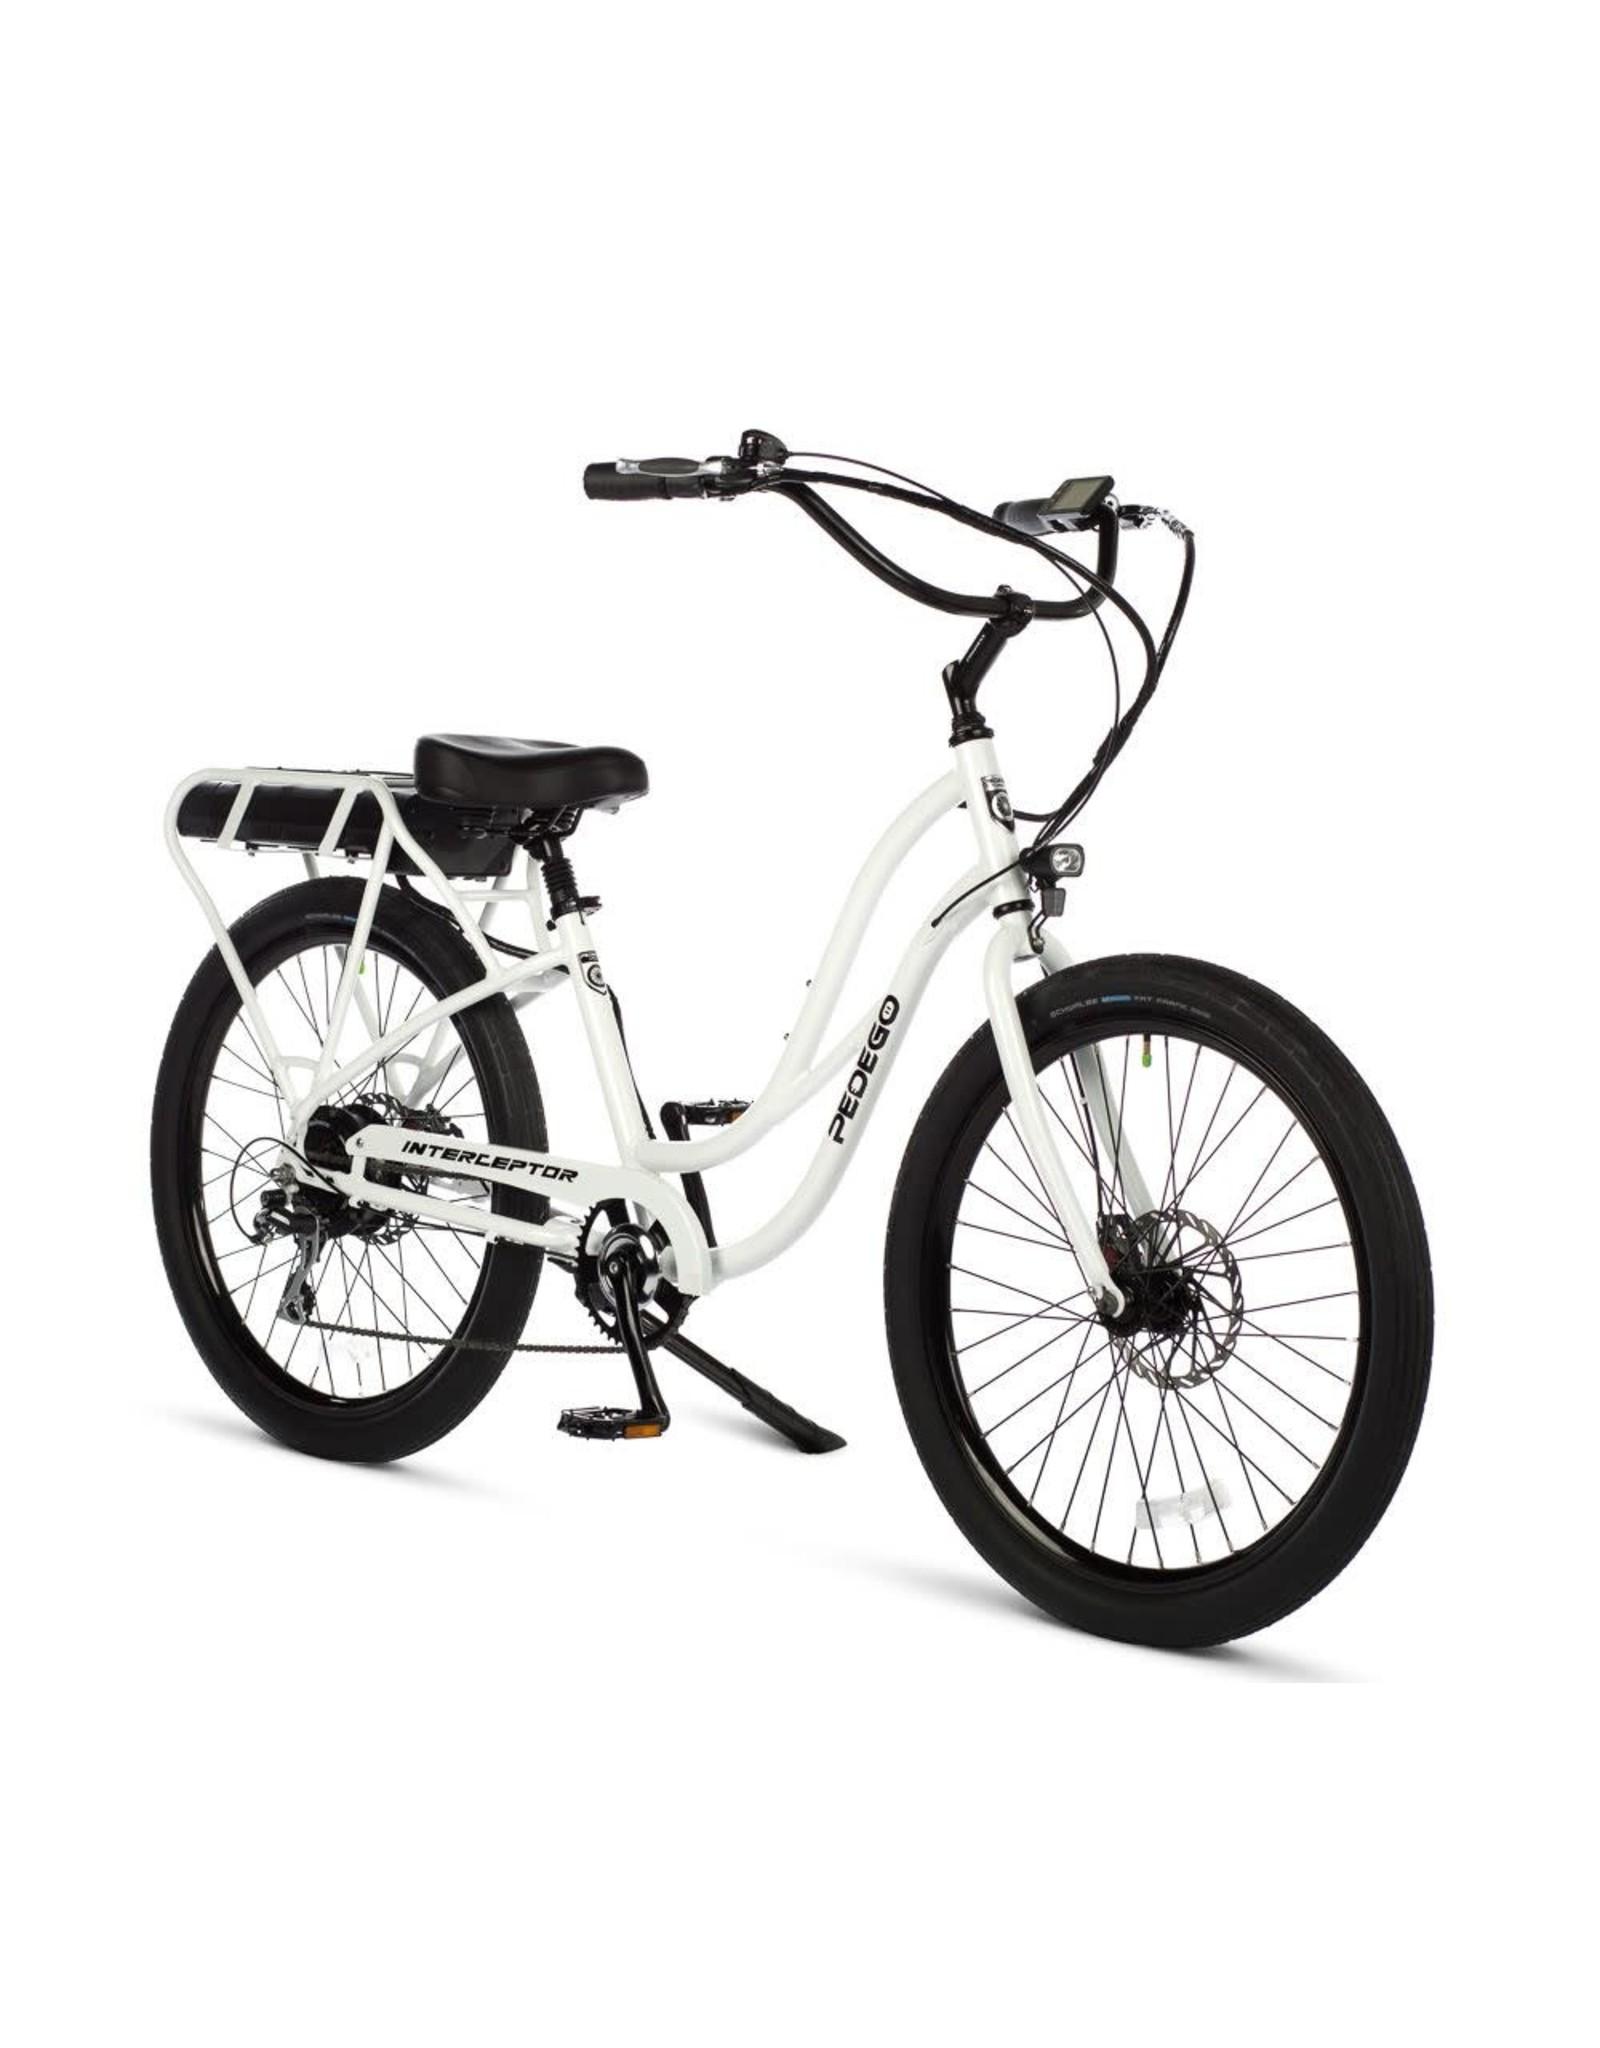 Pedego Electric Bikes Interceptor Step Thru (Used)